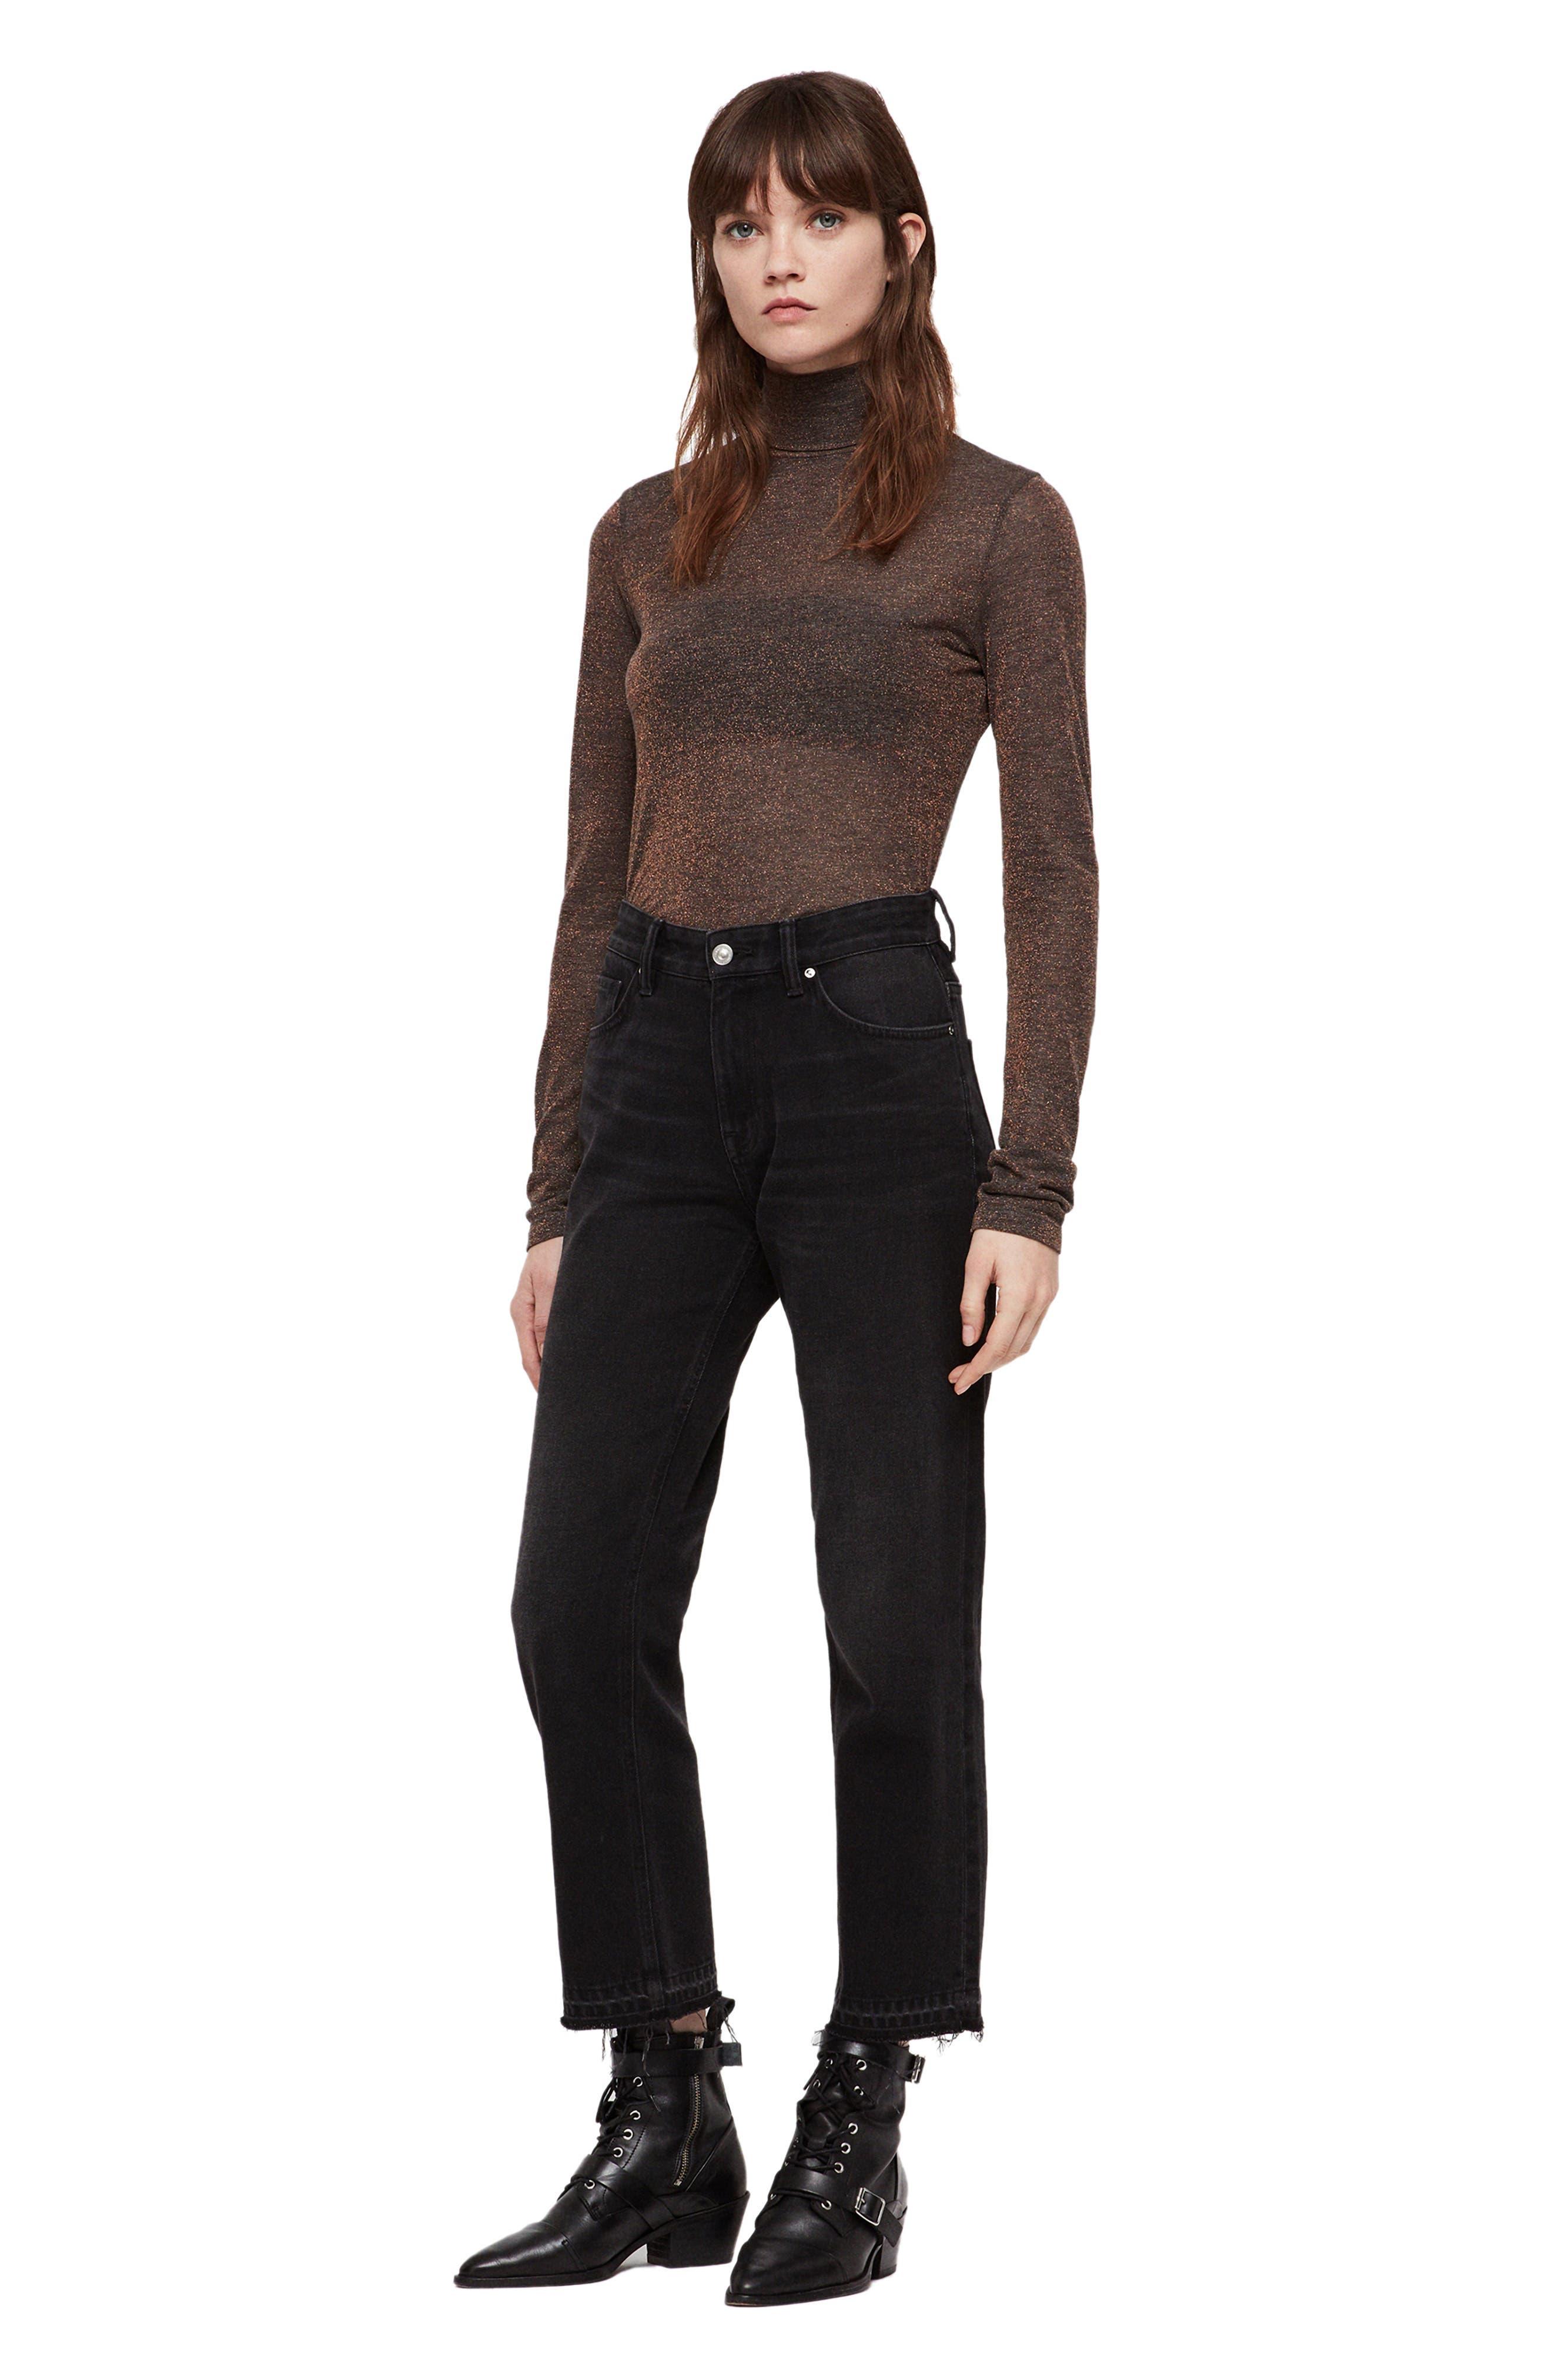 ALLSAINTS, Esme Turtleneck Sweater, Alternate thumbnail 4, color, BLACK